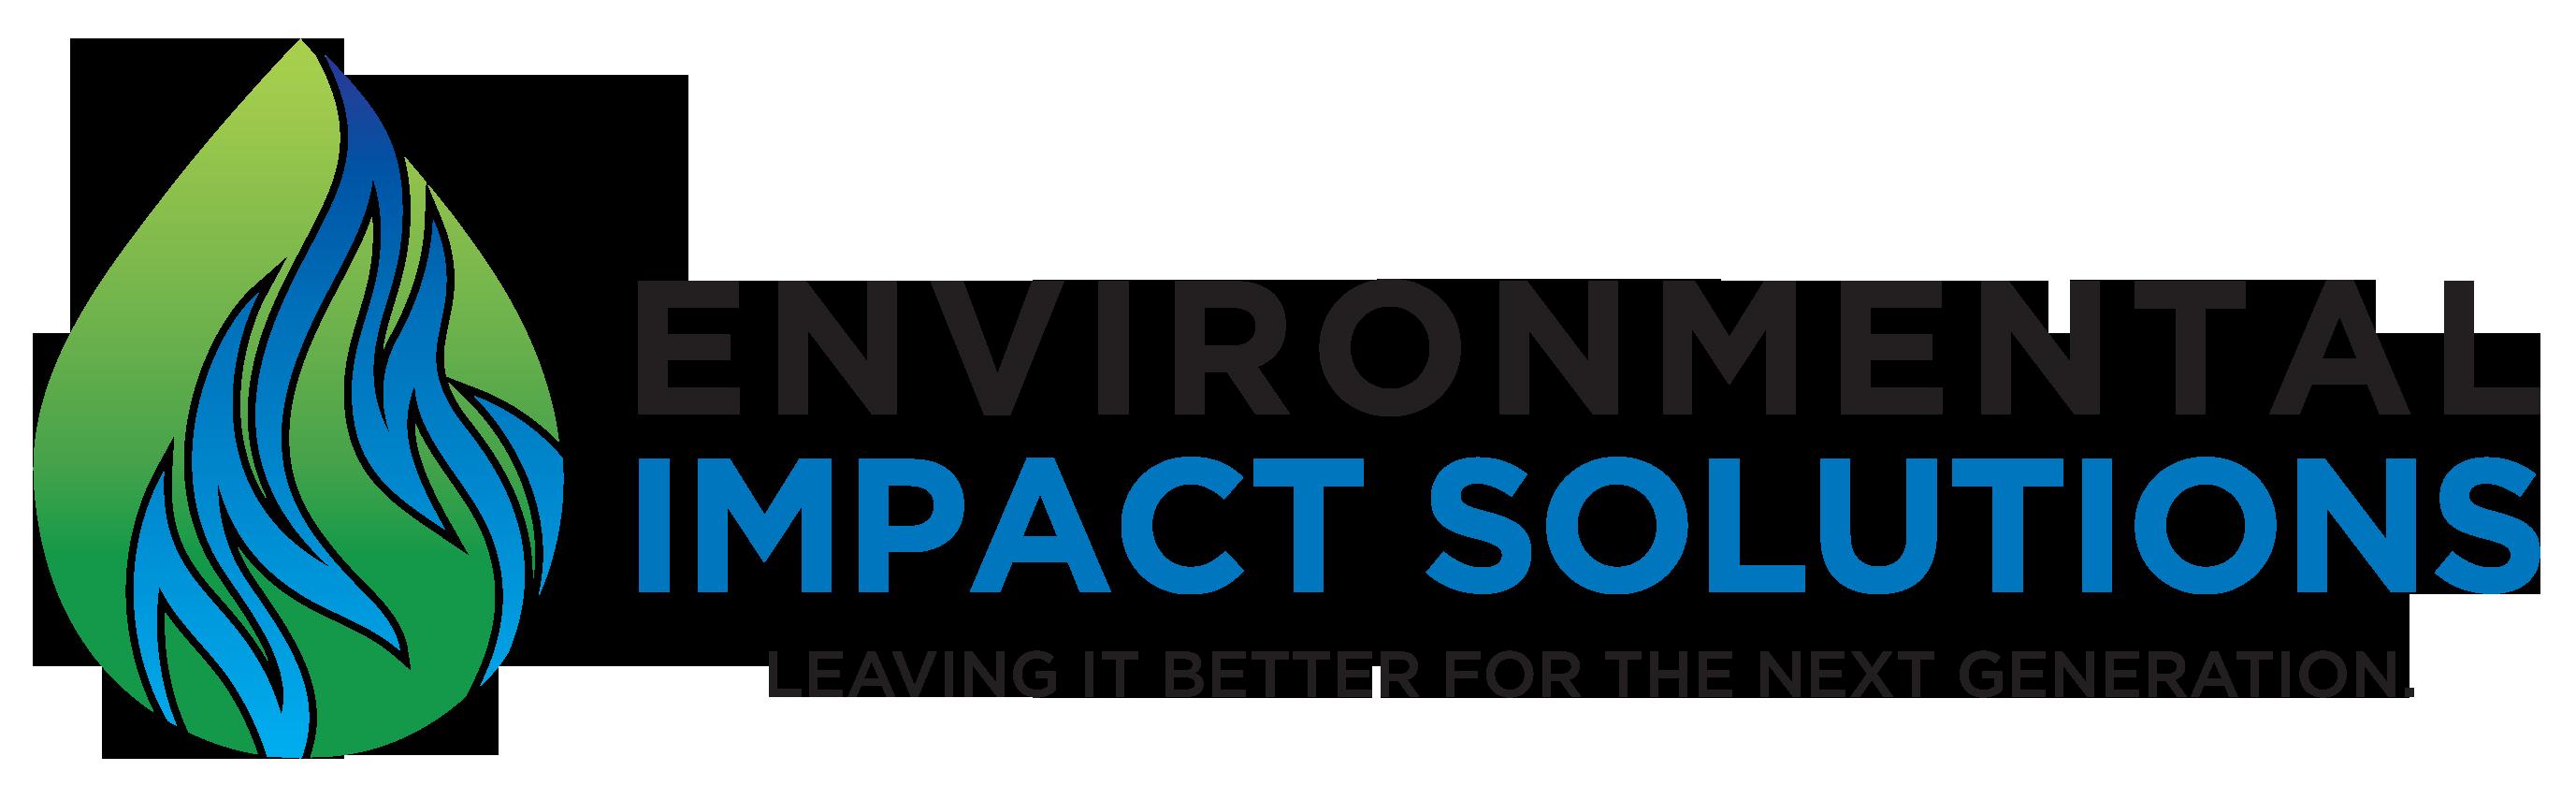 Environmental Impact Solutions